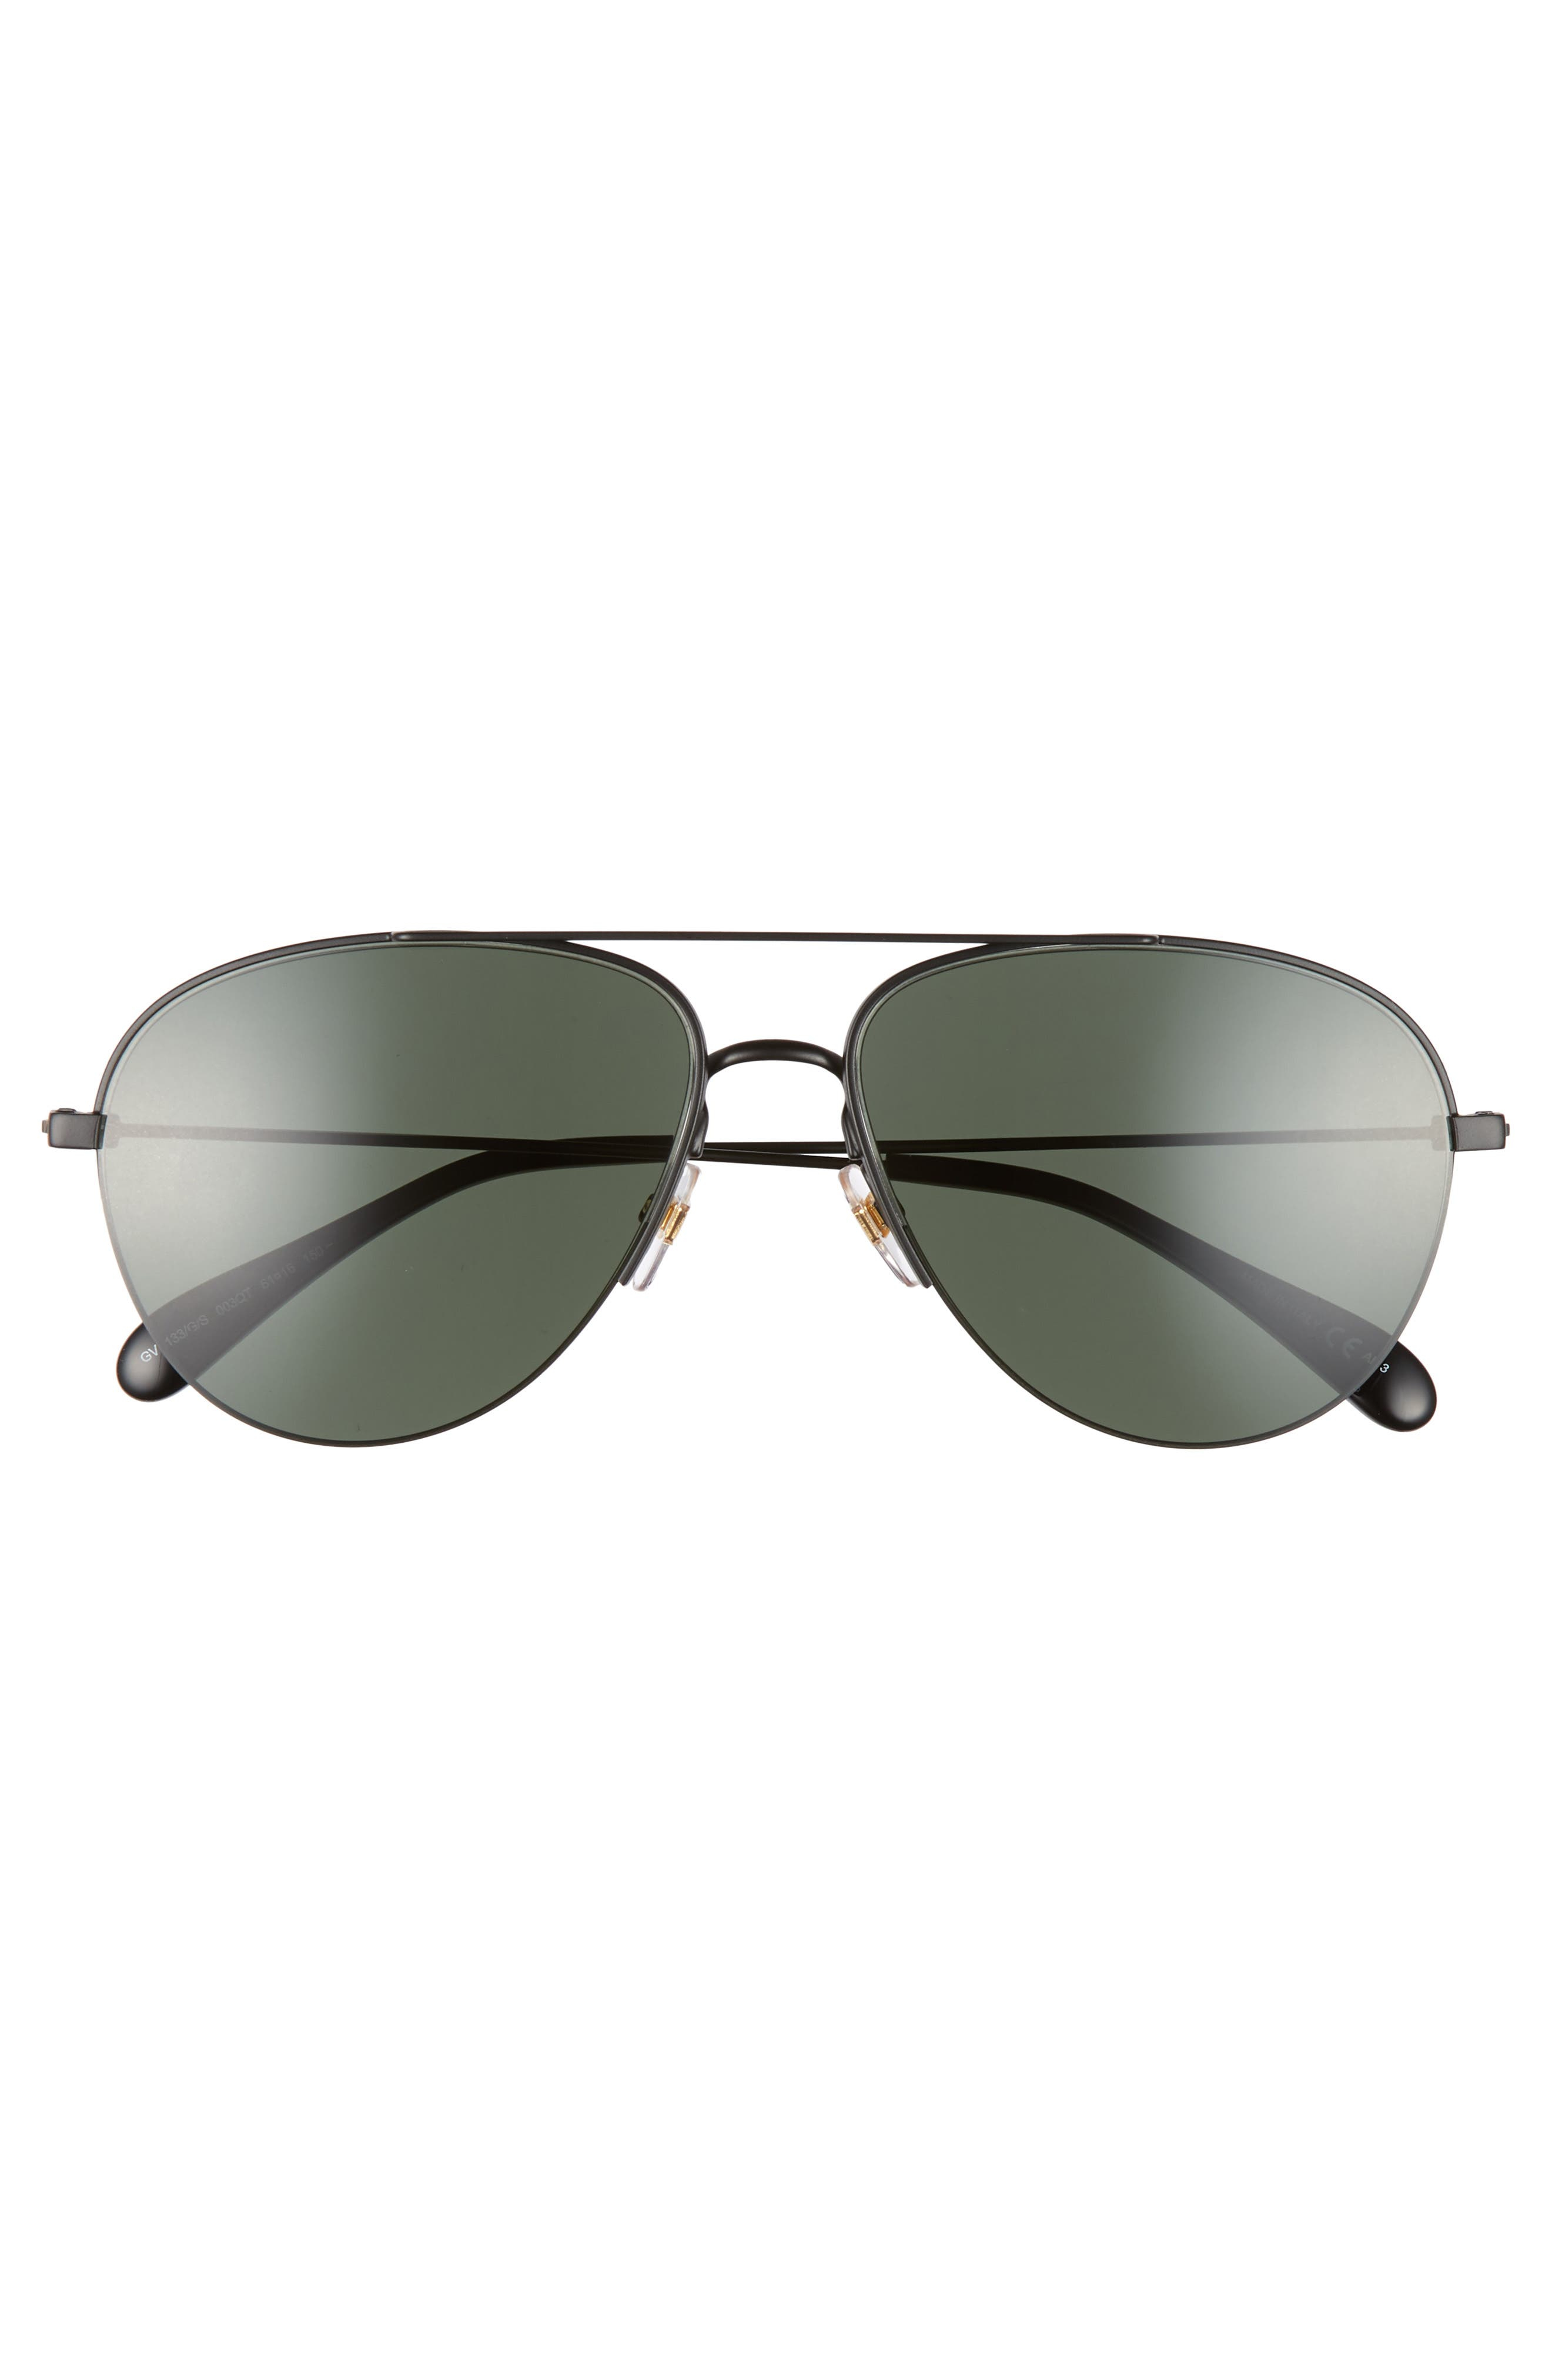 GIVENCHY,                             61mm Aviator Sunglasses,                             Alternate thumbnail 3, color,                             MATTE BLACK